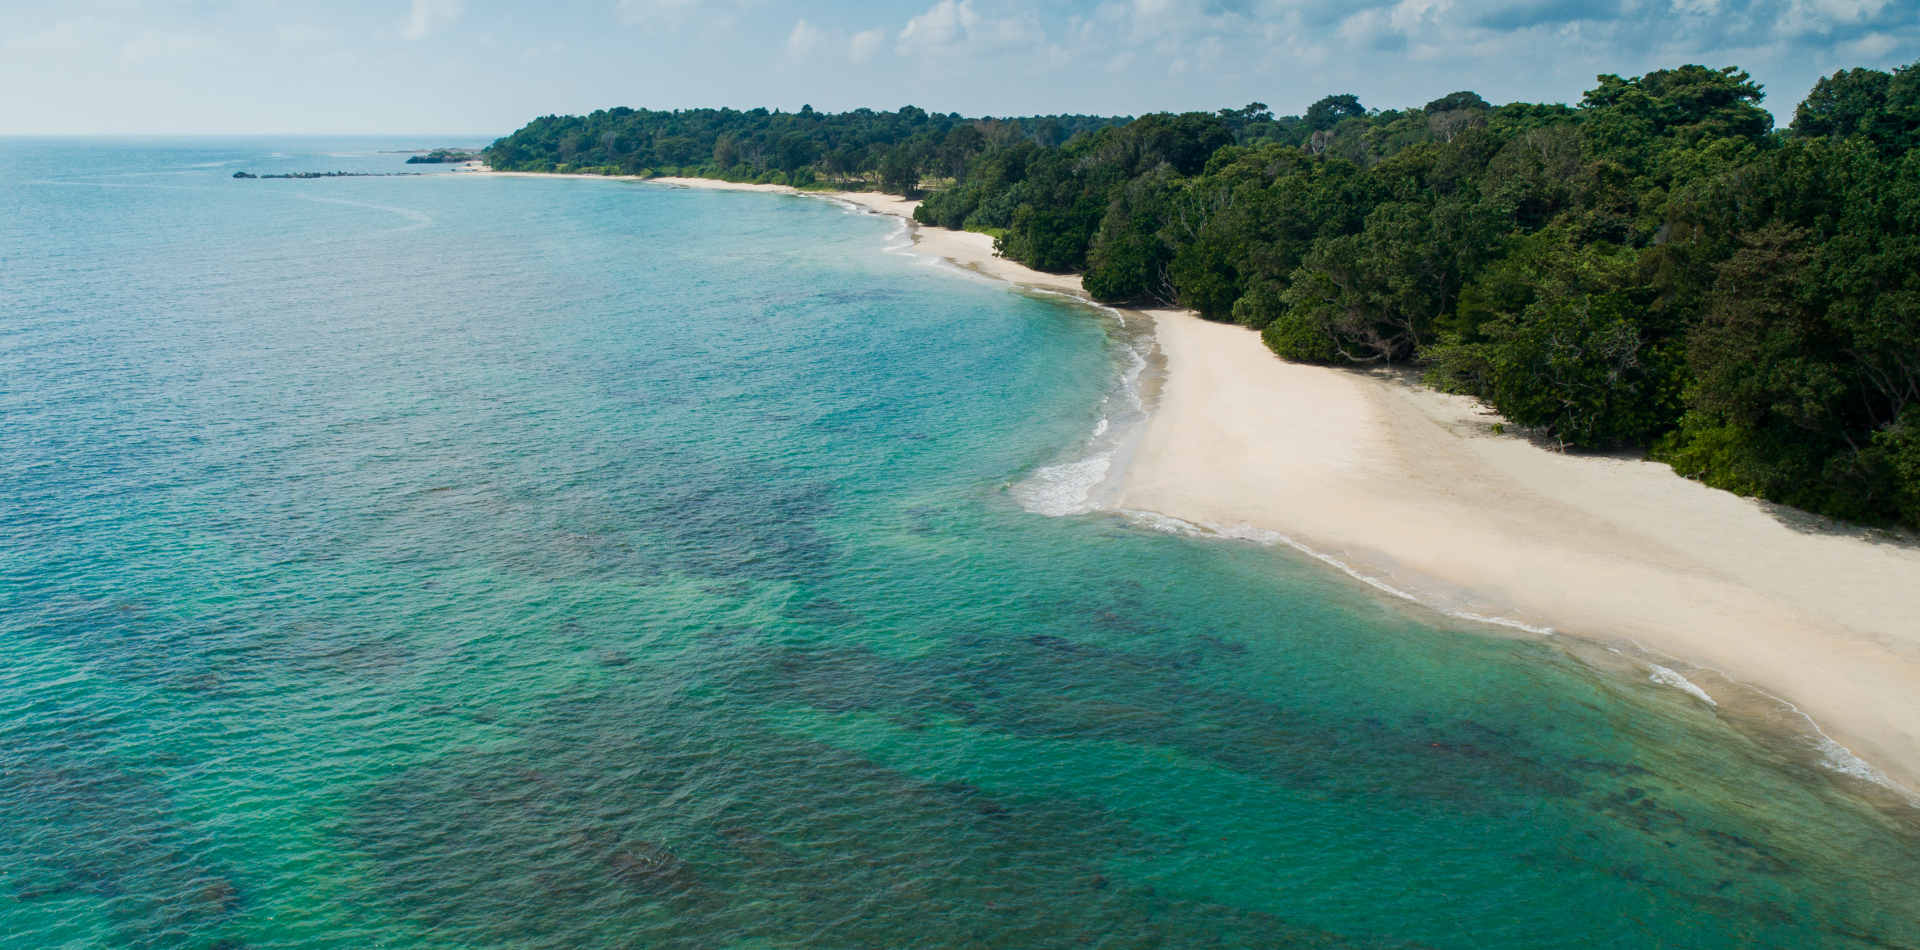 Luxusreise in Malaysia - One & Only Desaru Coast